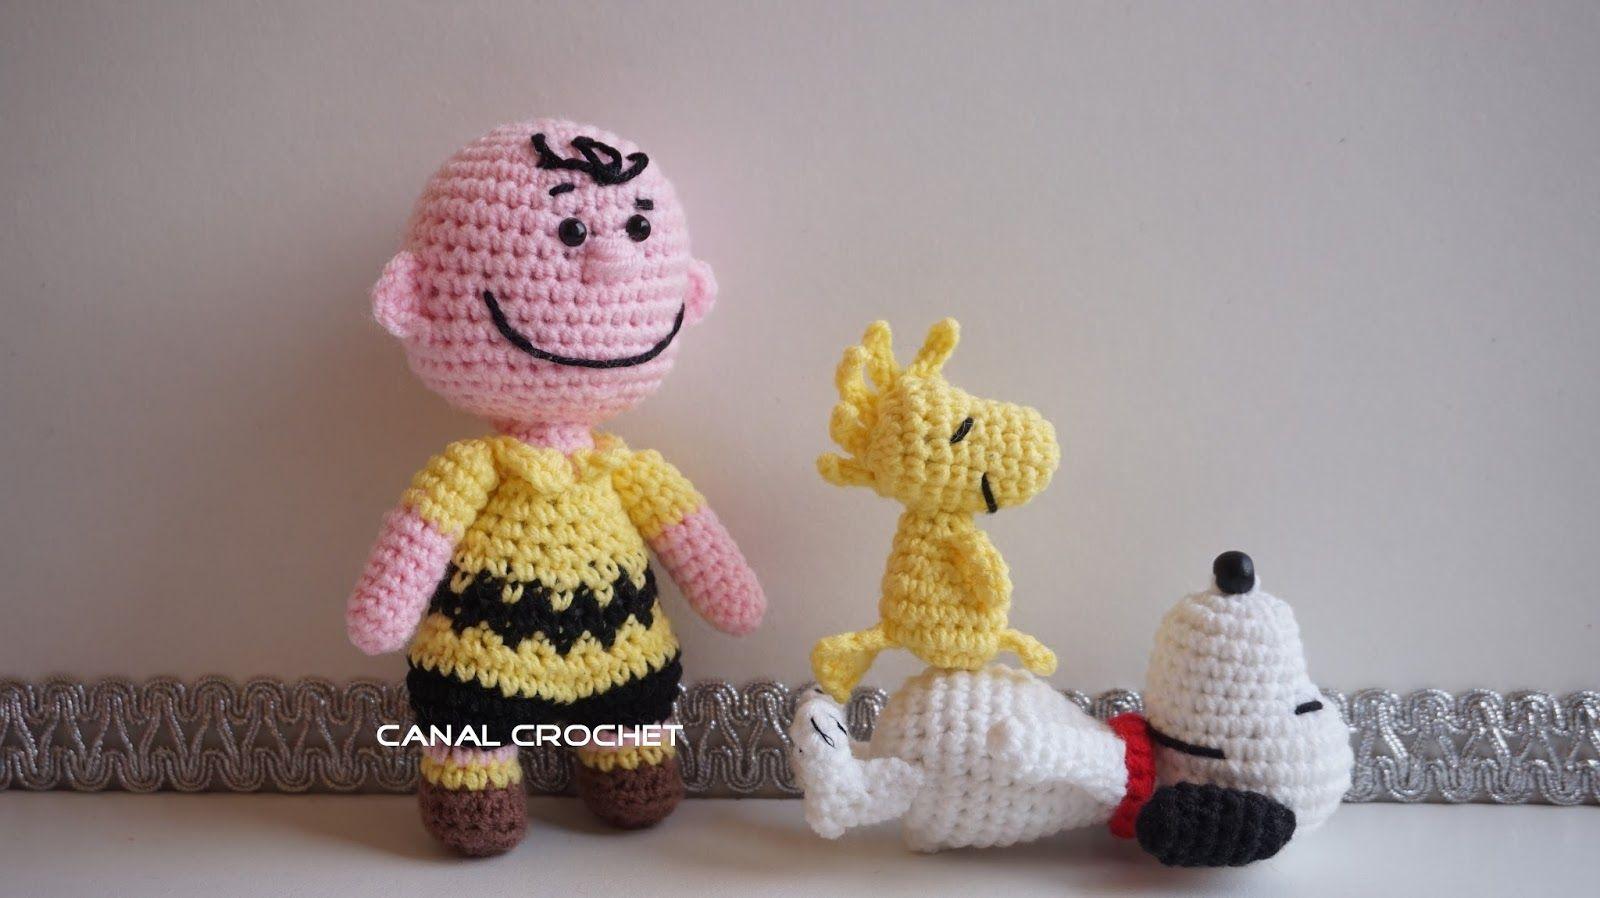 CANAL CROCHET: patrón libre   Charlie Brown   Pinterest   Crochet ...